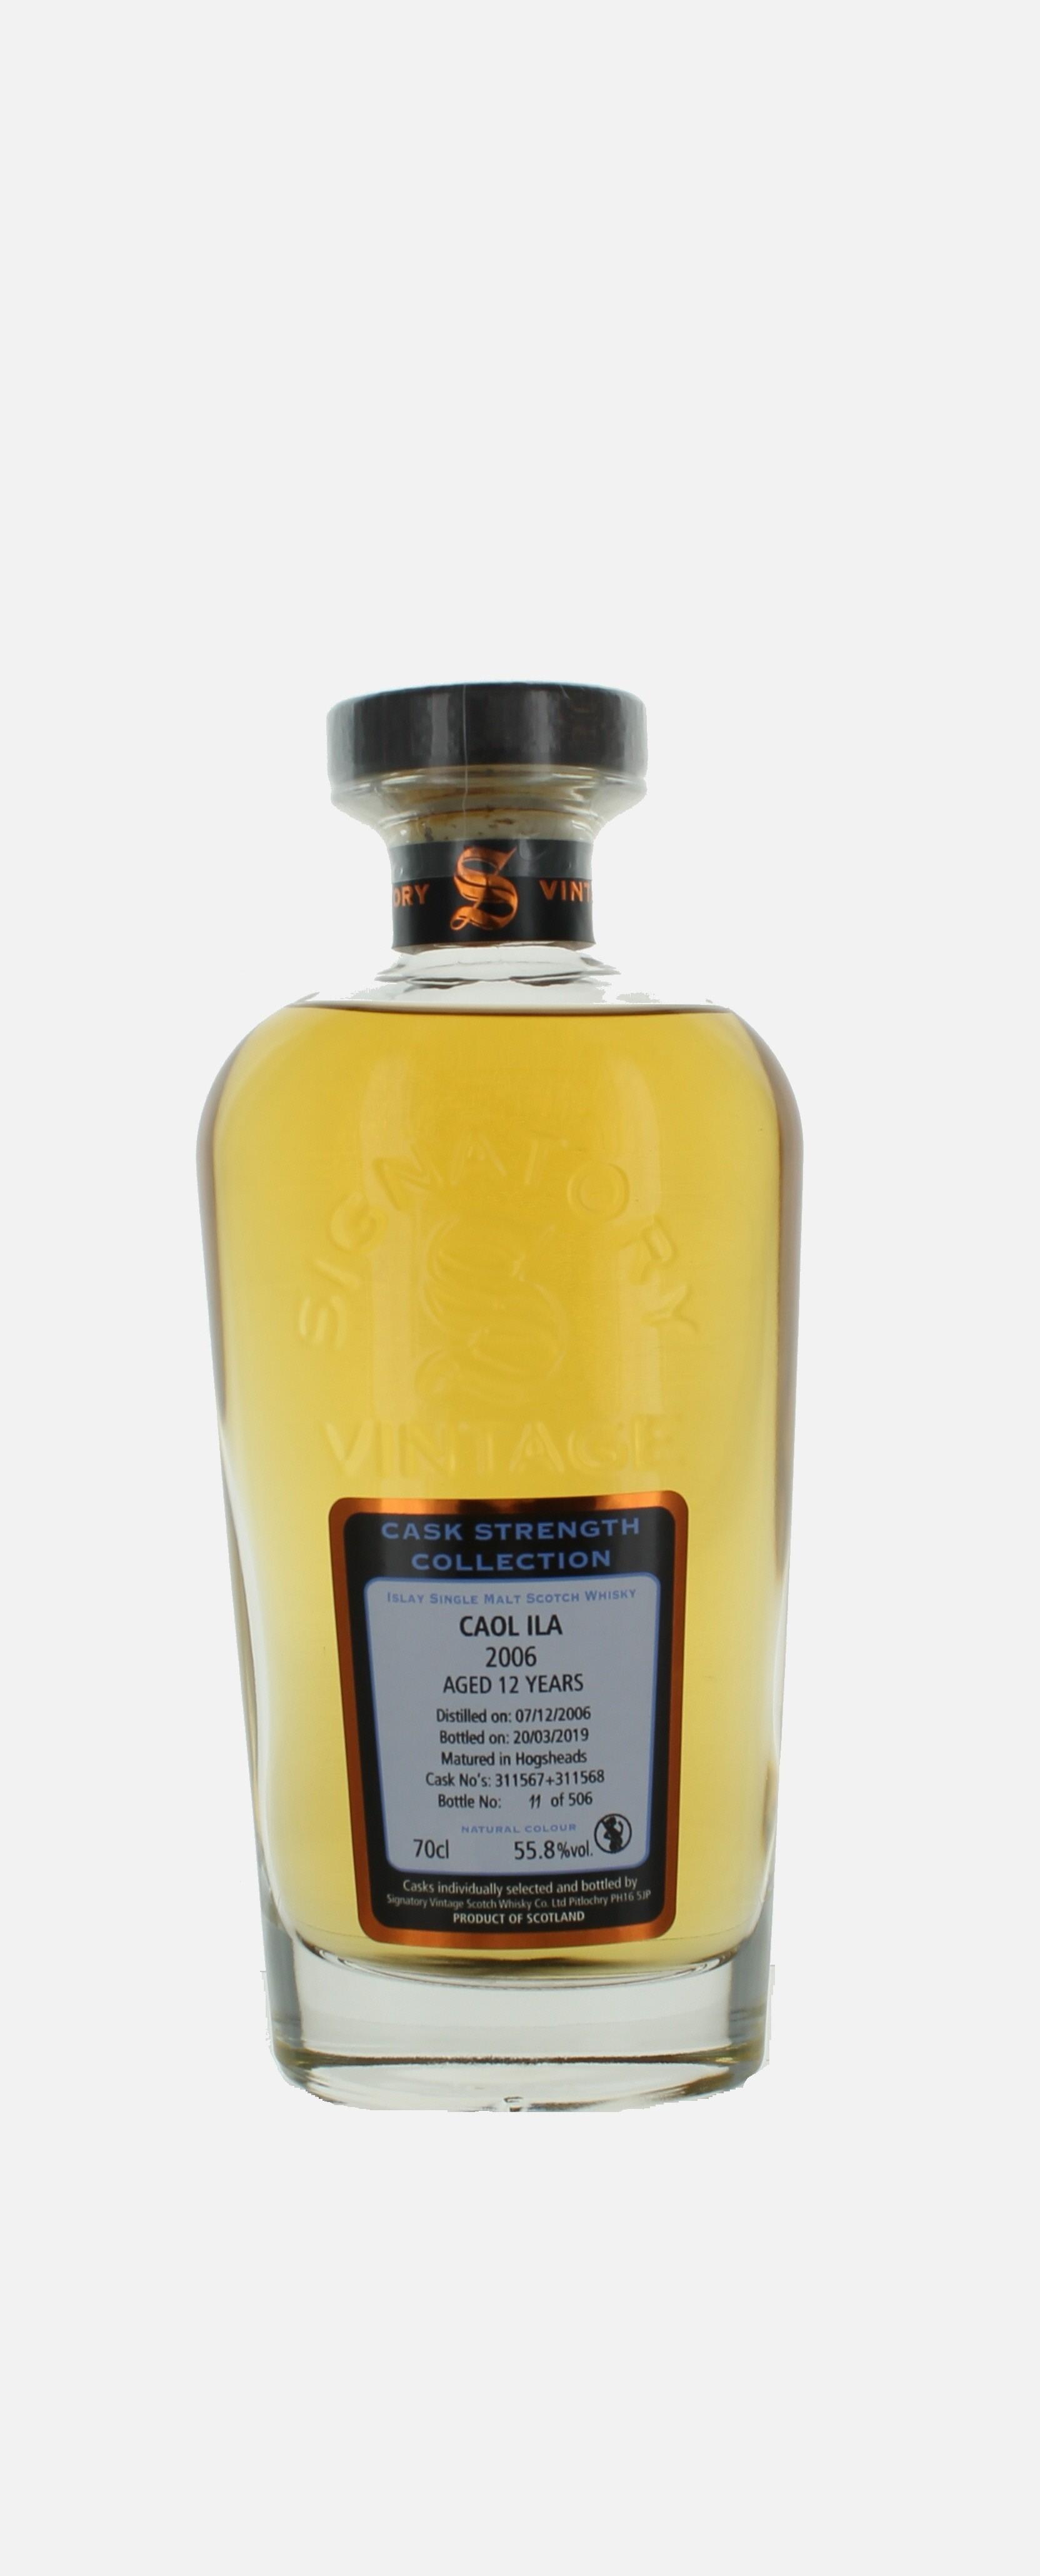 Caol Ila, Single Malt Scotch Whisky, Islay